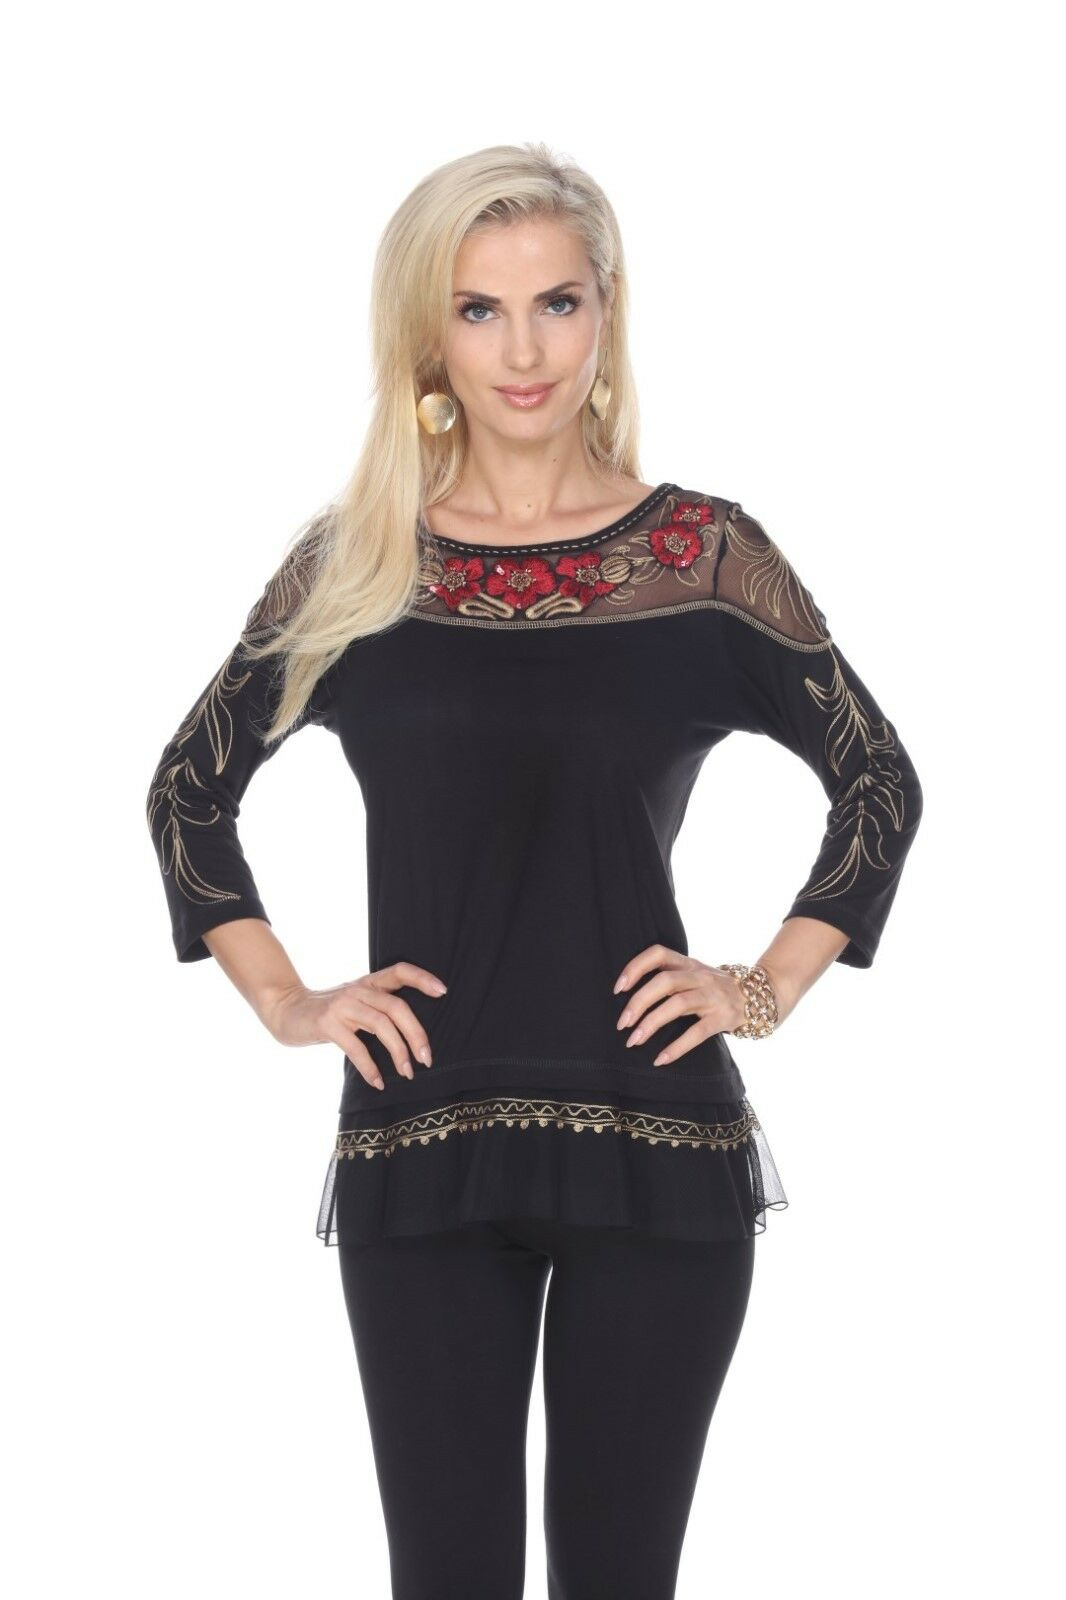 Woherren Top Tunic Blouse schwarz rot Sheer Mesh Krista Lee Astoria Embroidery NEW